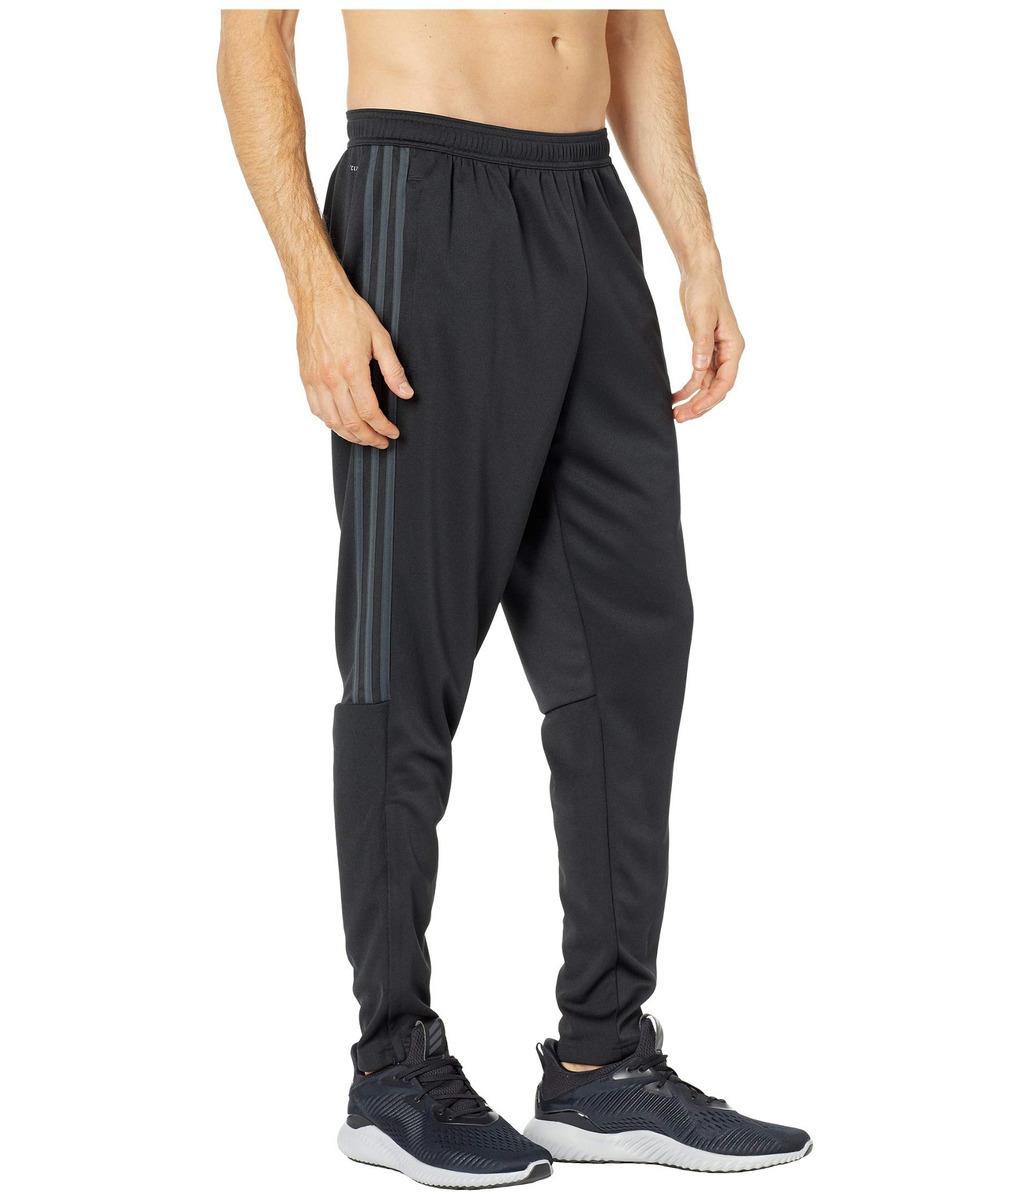 Adidas Pants Pantalon 19 Hombre Sereno shdBtrCQx